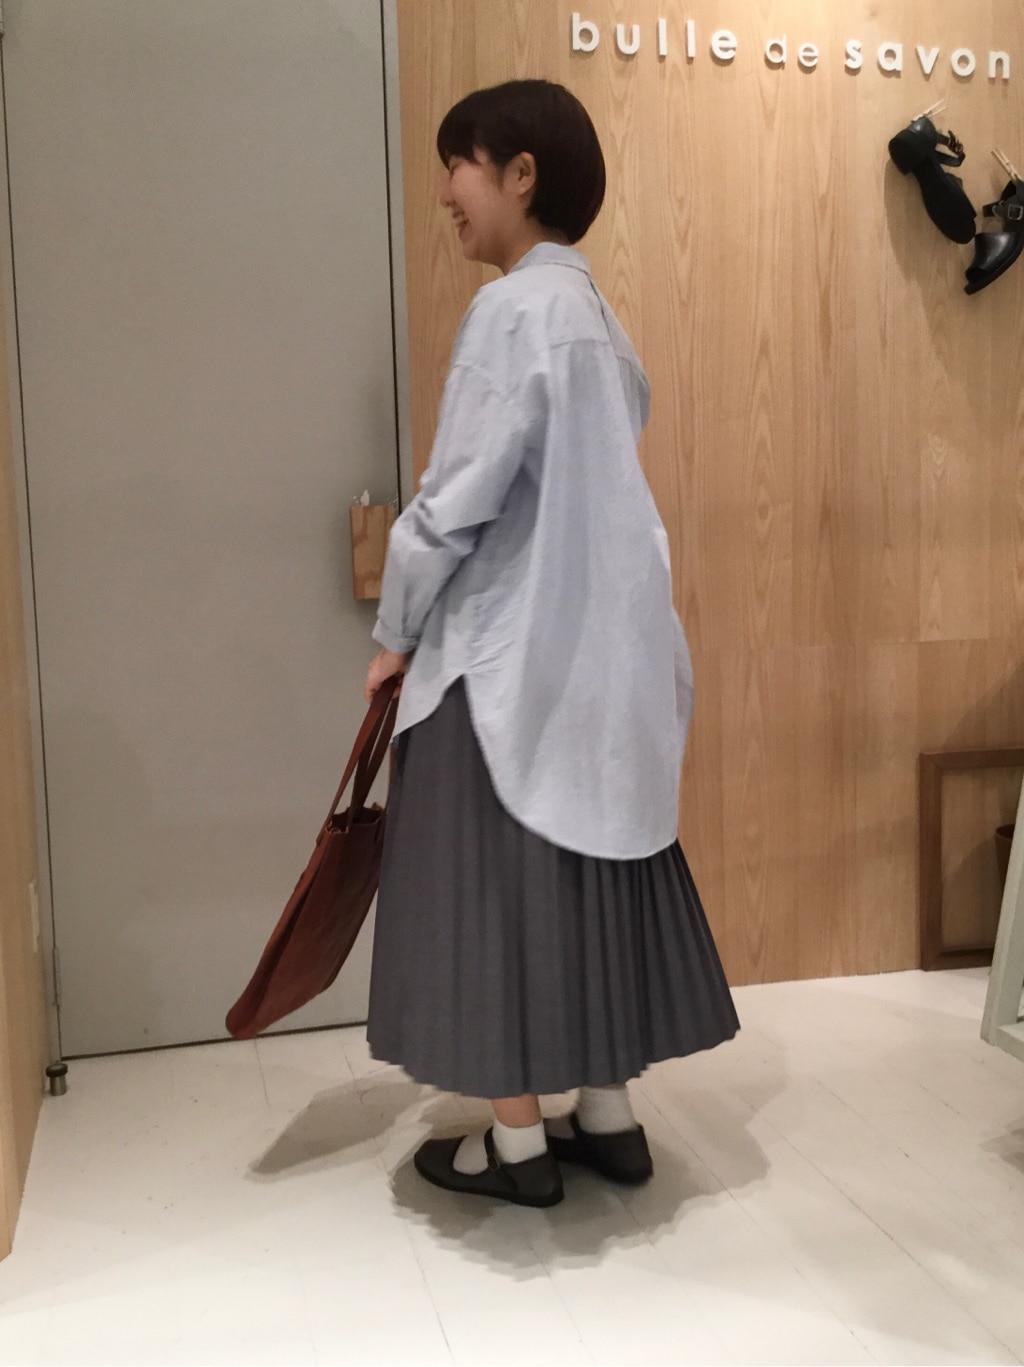 bulle de savon なんばシティ 身長:149cm 2020.02.20